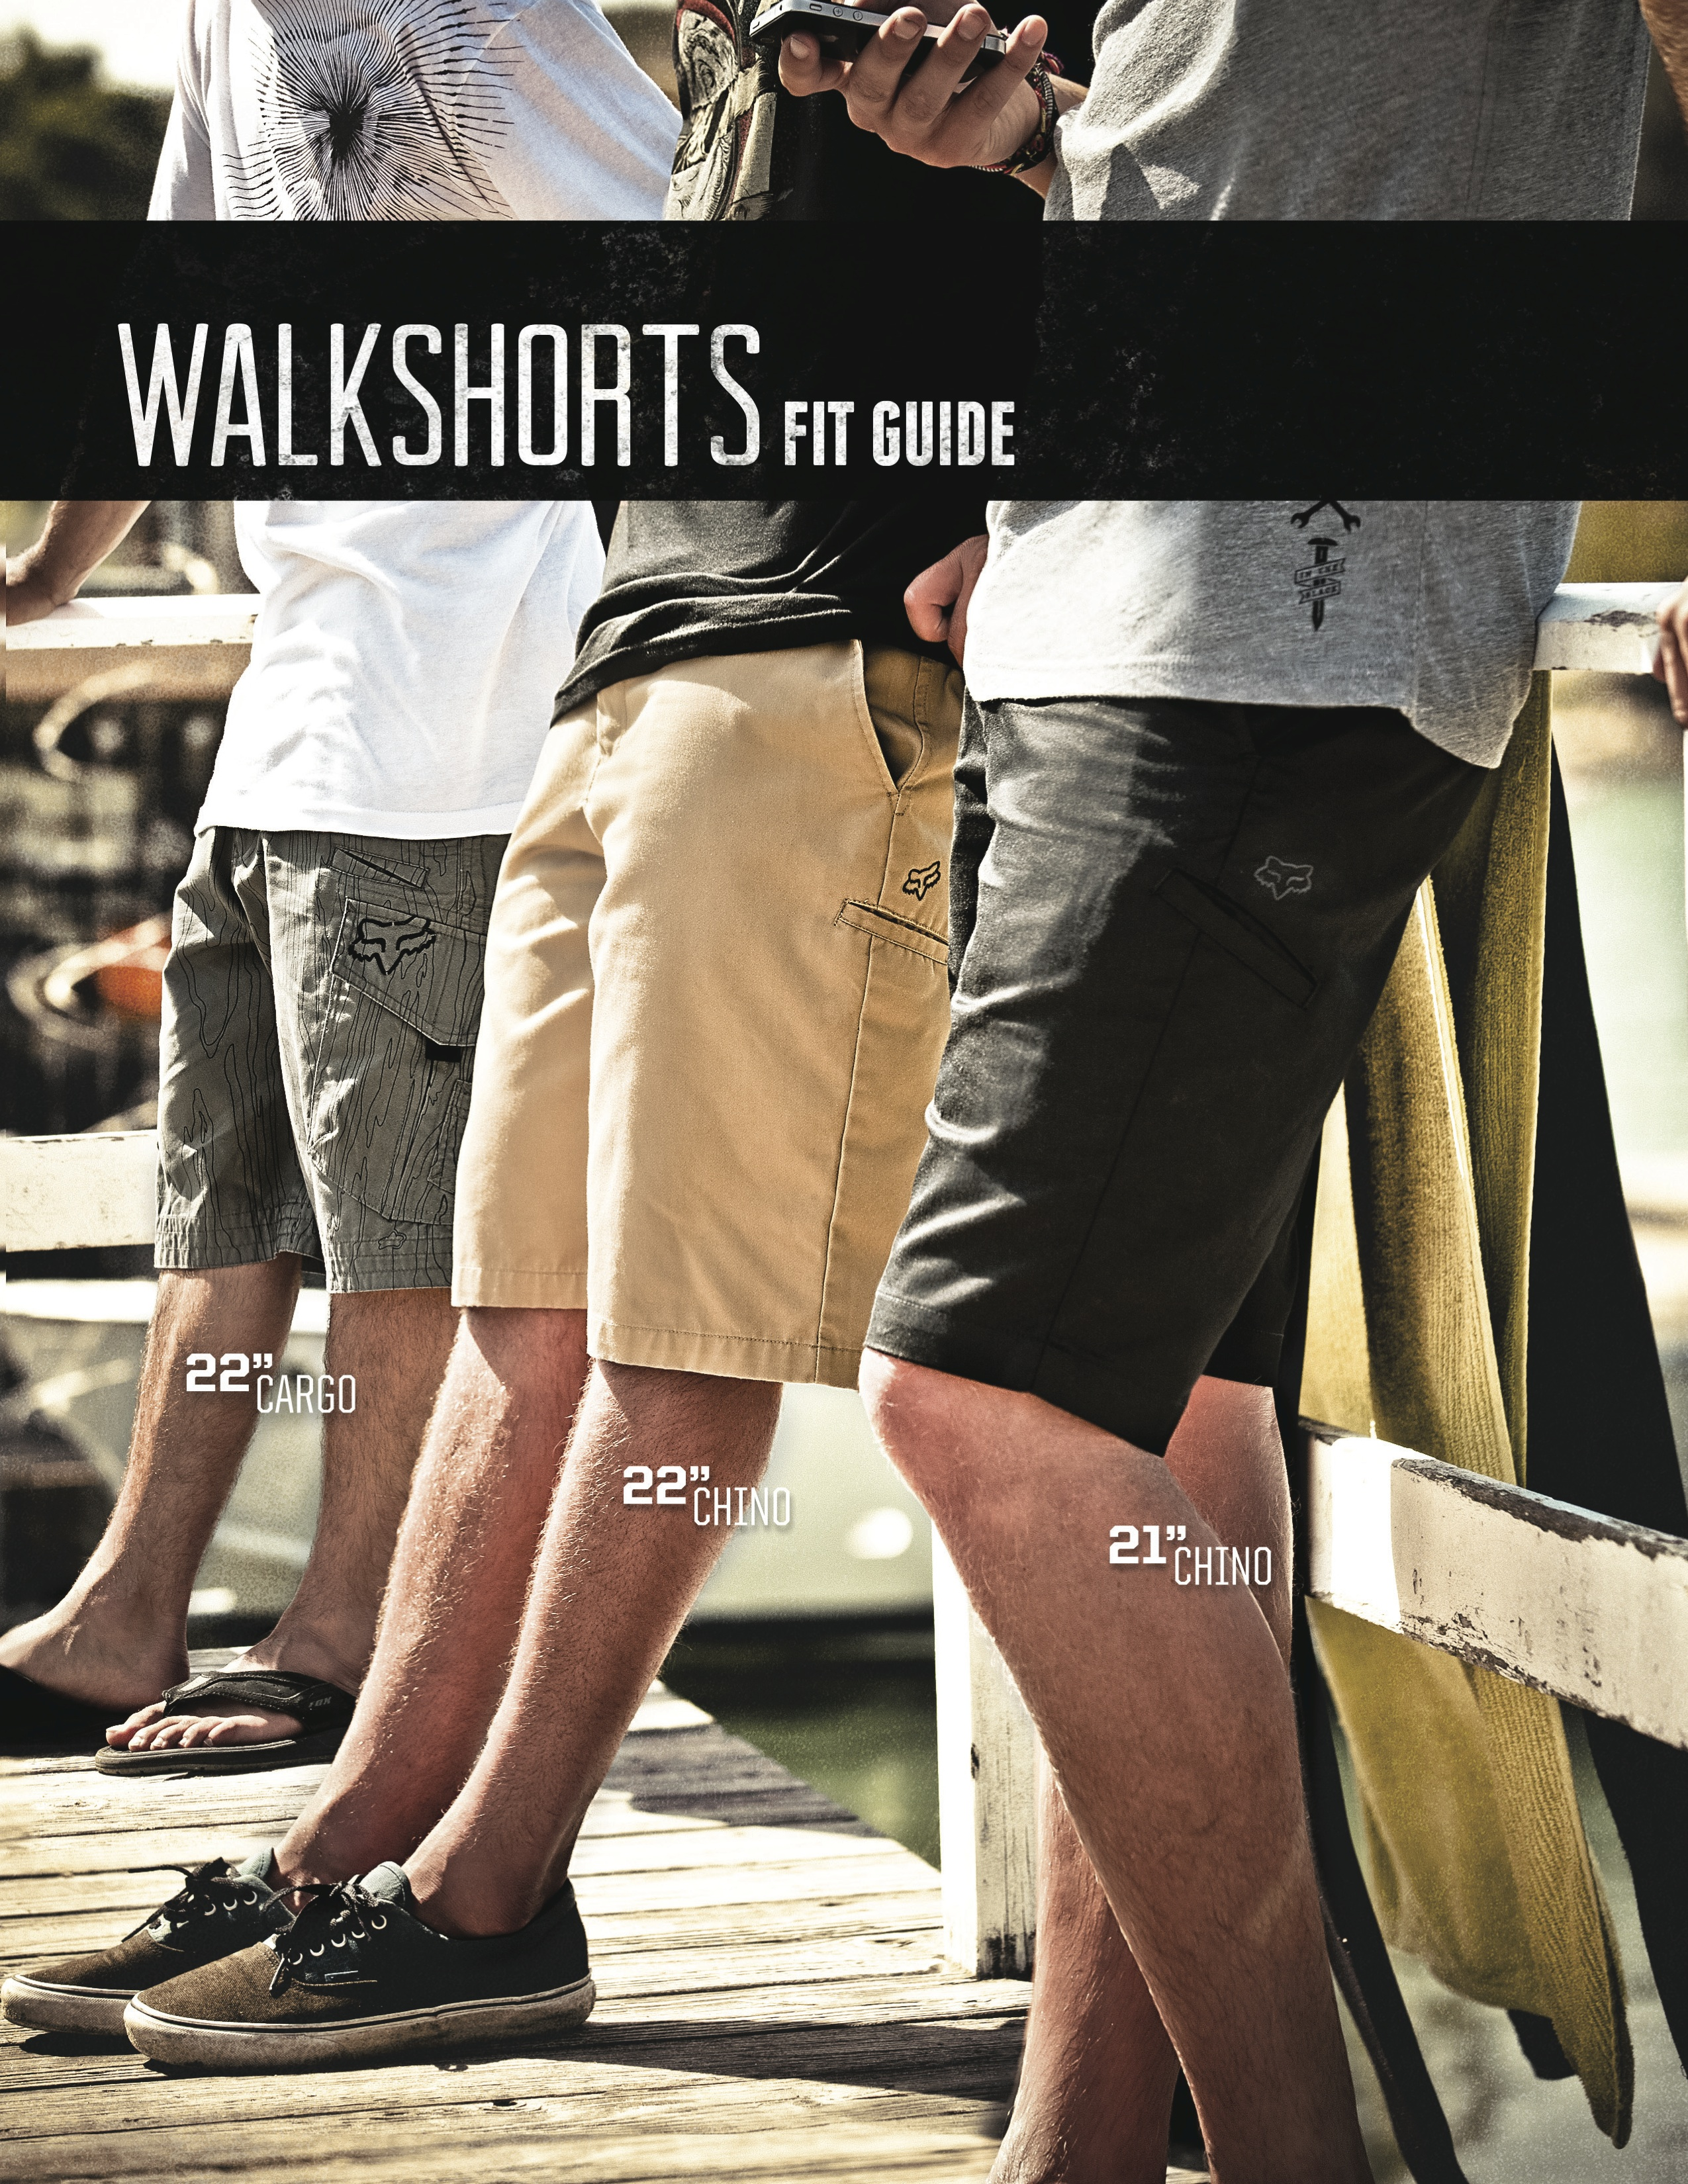 walkshort guide